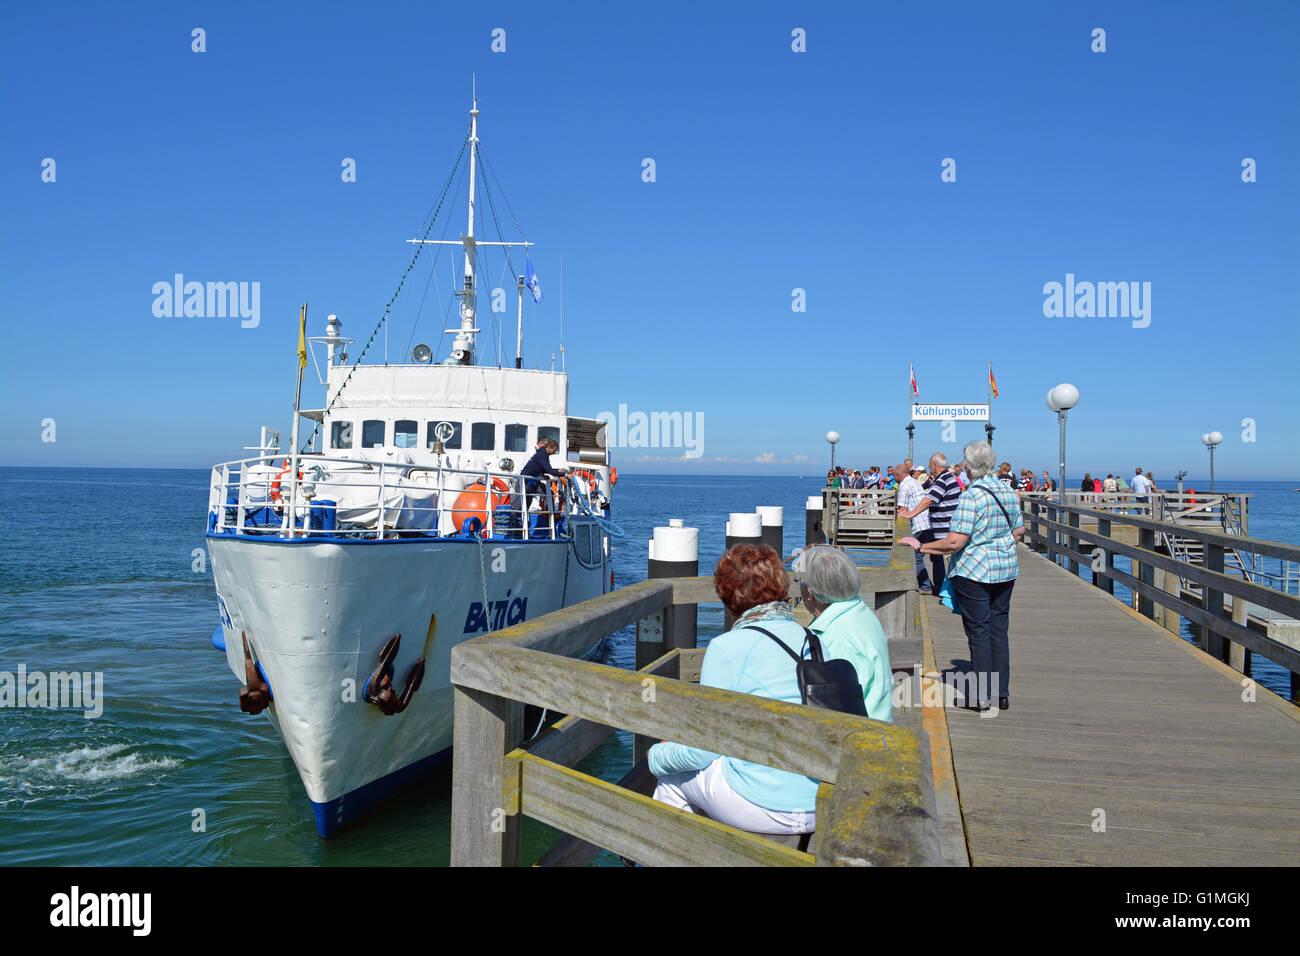 Passenger ship inKuehlungsborn, at the Baltic sea, Germany - Stock Image